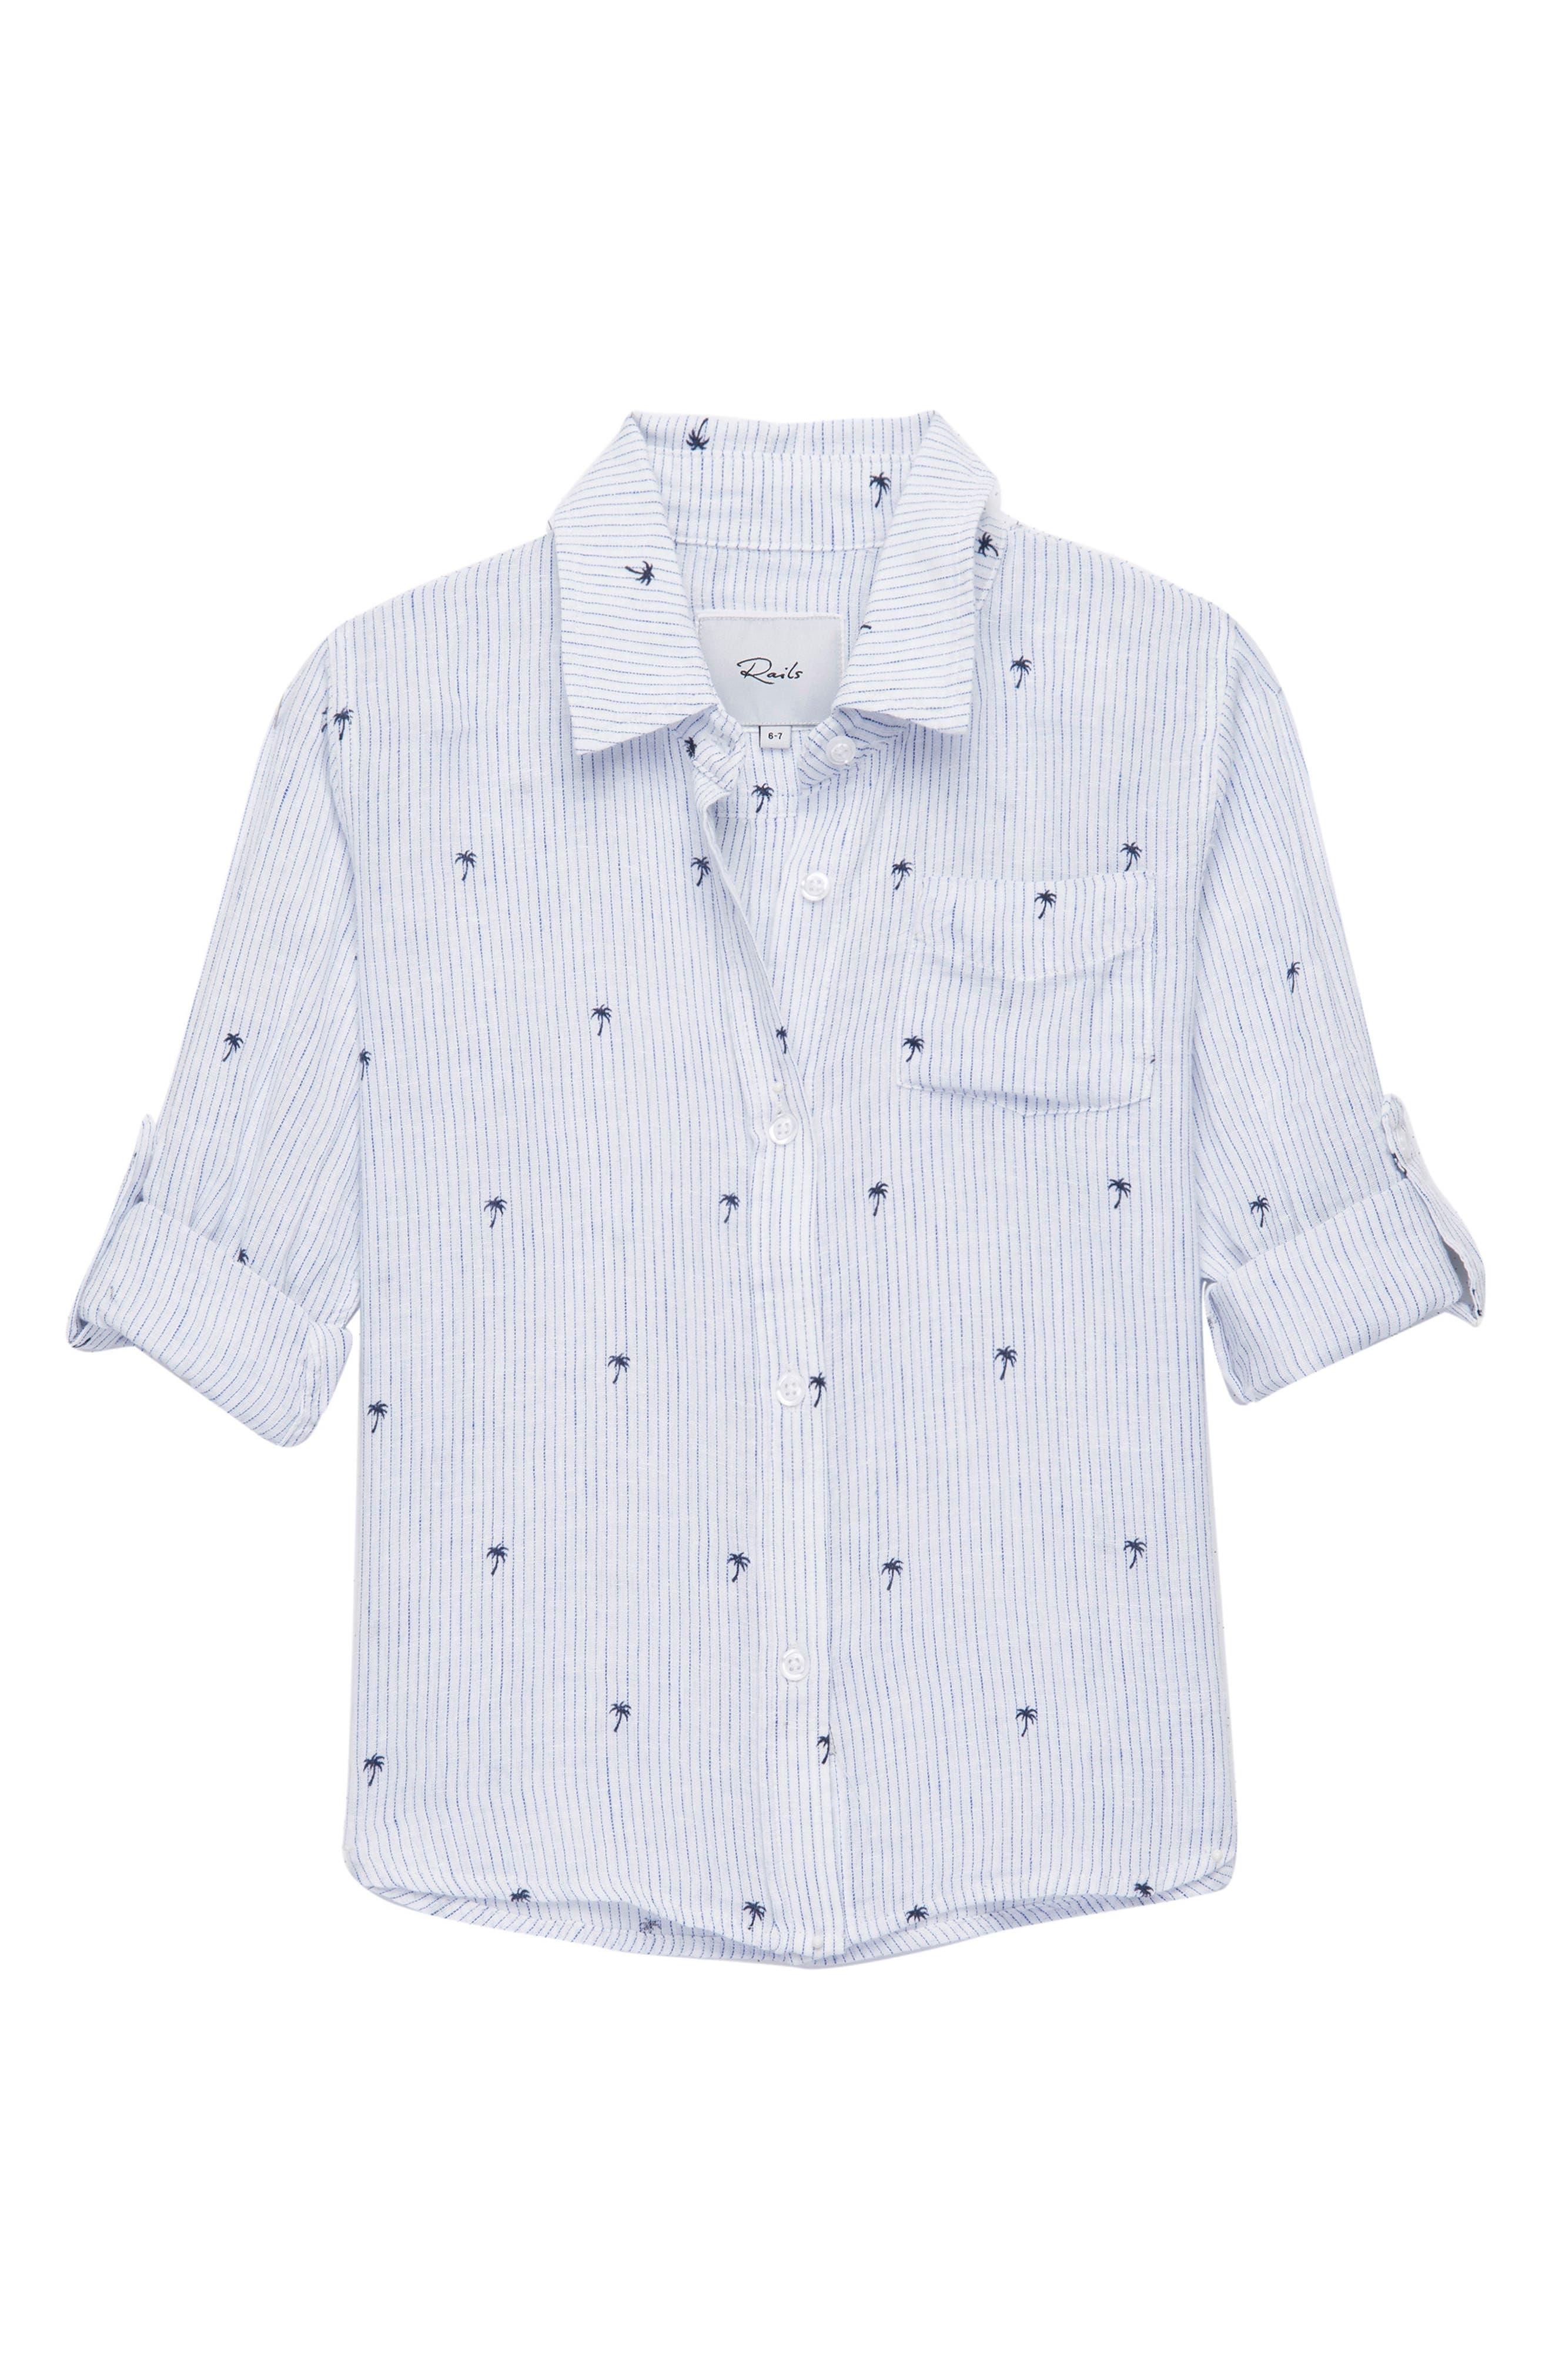 Cora Palm Woven Shirt,                         Main,                         color, 143